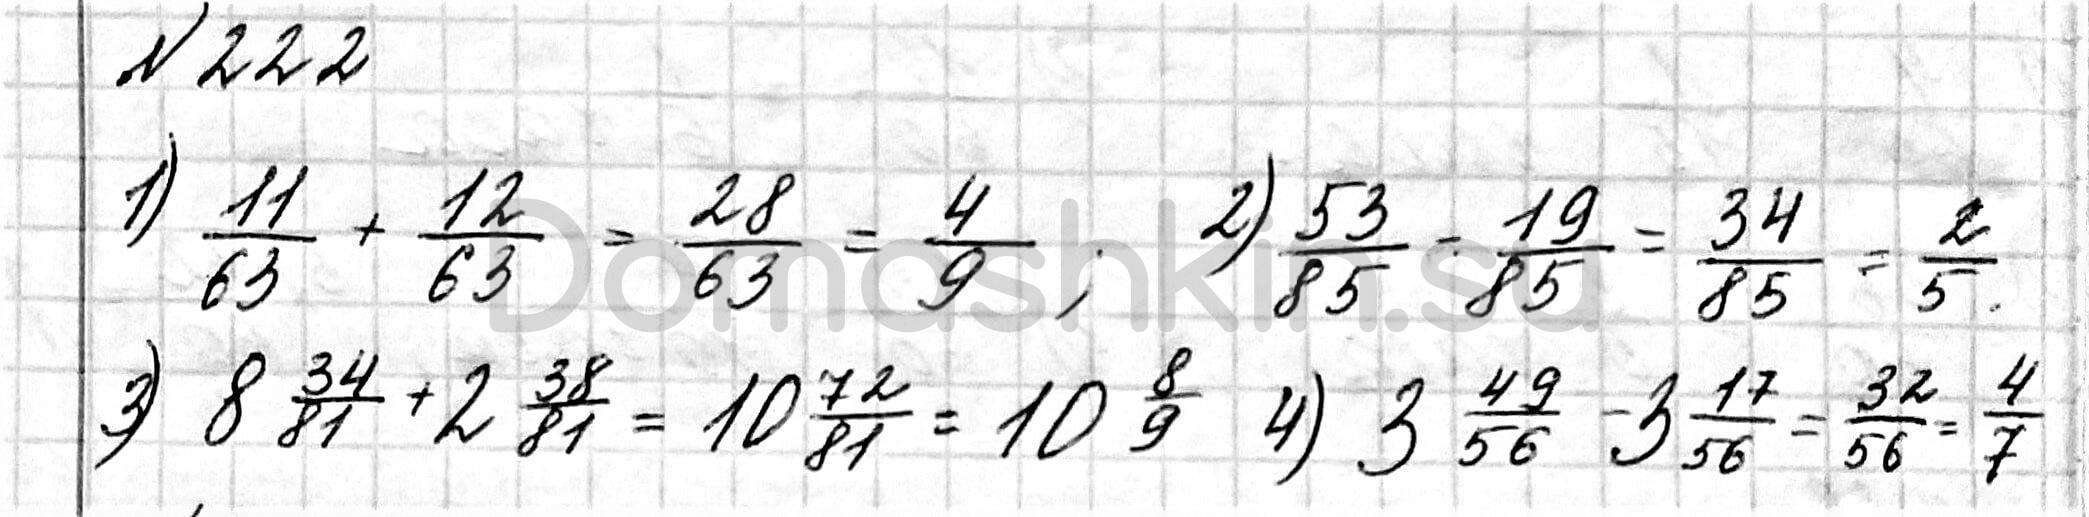 Математика 6 класс учебник Мерзляк номер 222 решение